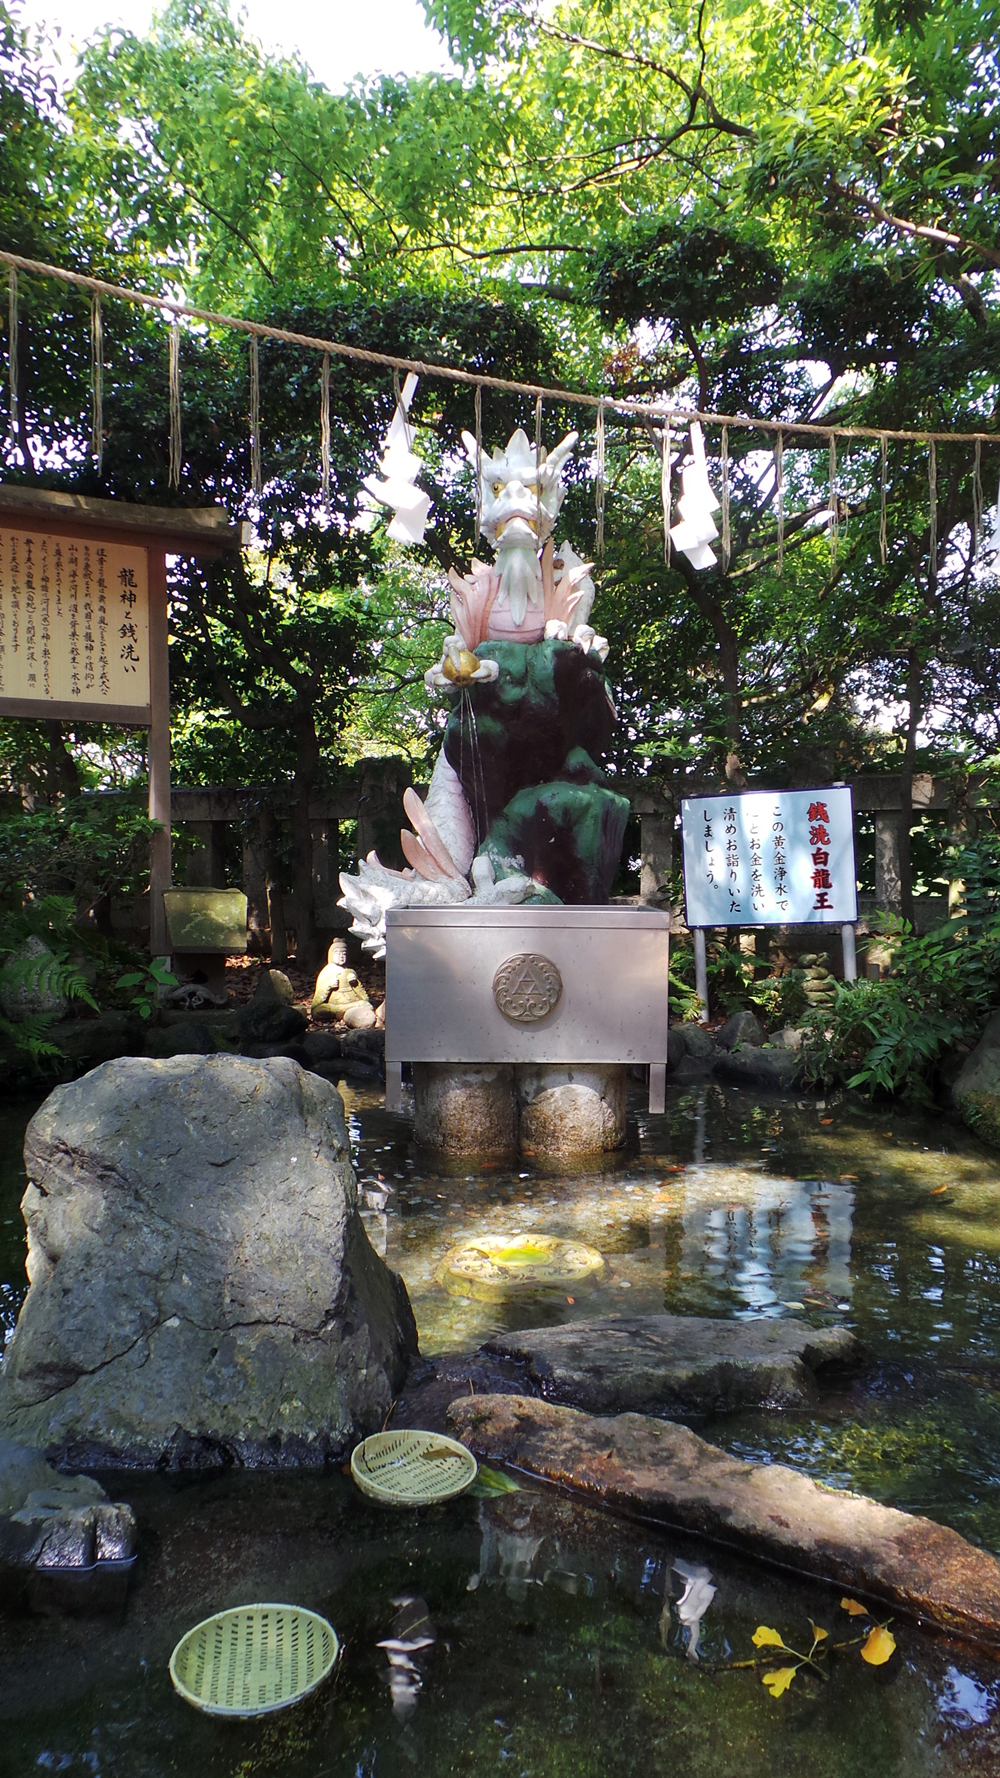 Fontaine dragon du temple d'Enoshima